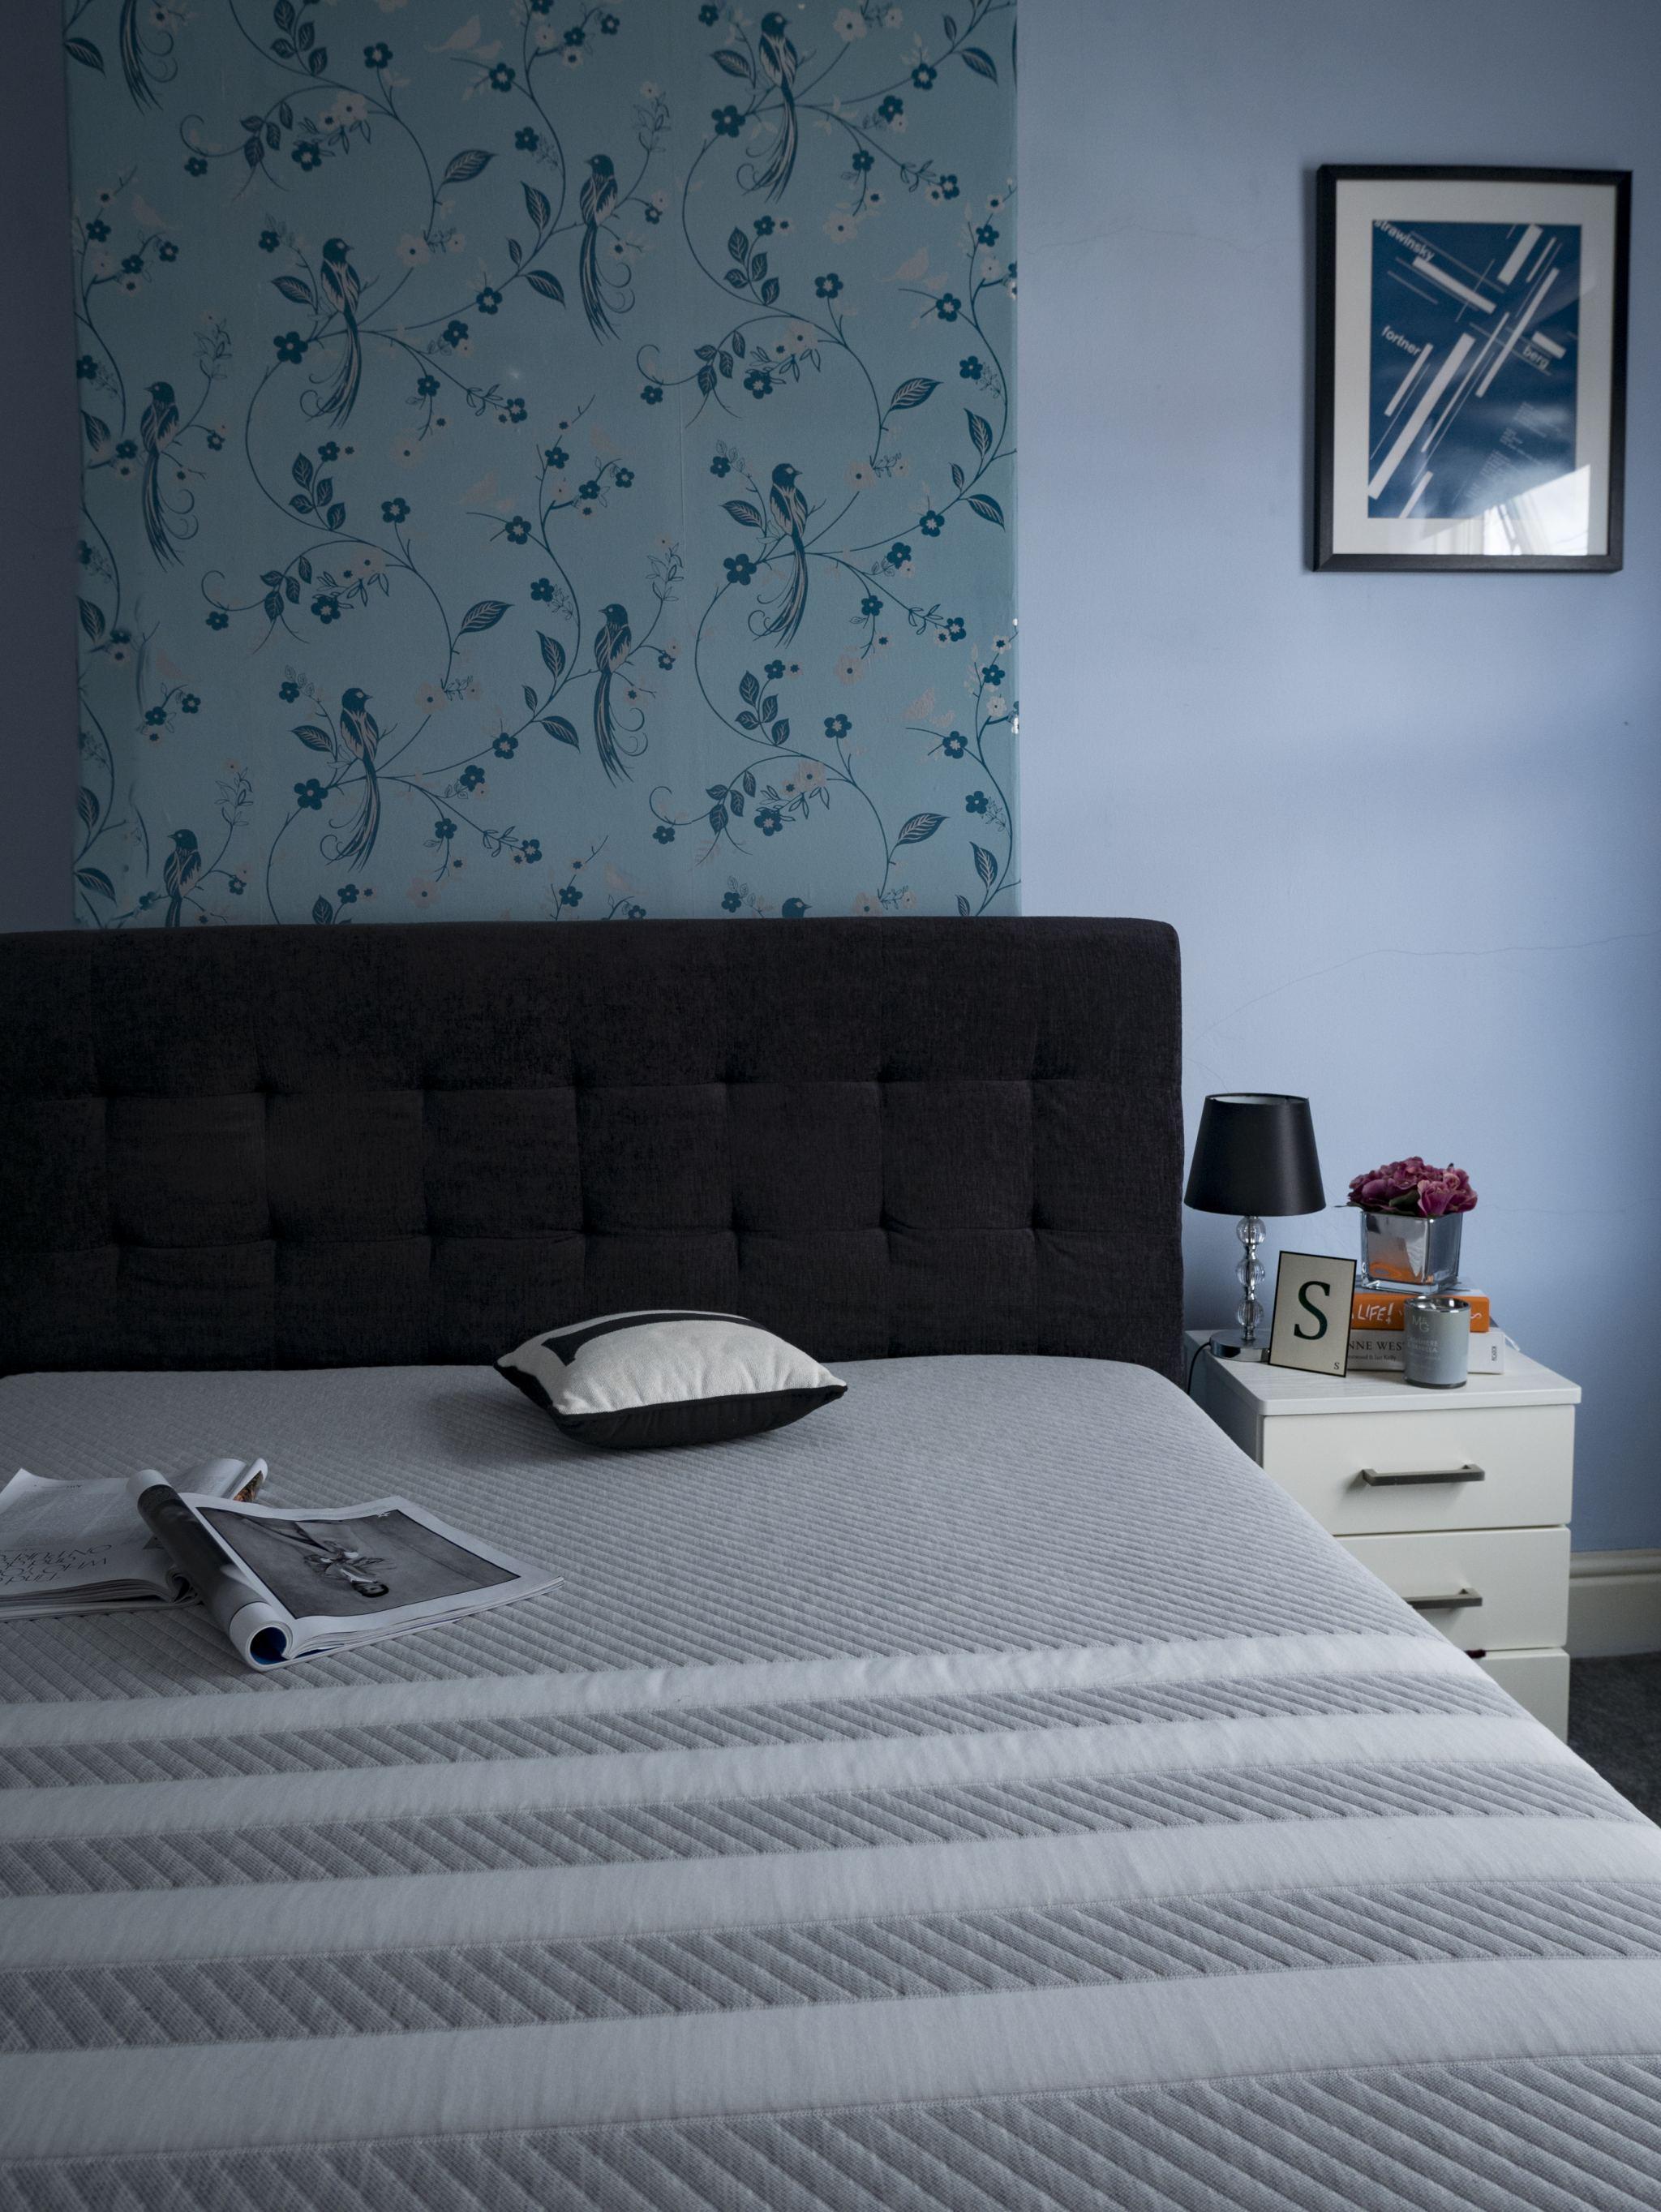 manchester blogger, manchester fashion blogger, mattress, Leesa mattress, sleepeing well, blogger, ukbogger ,pyjamas